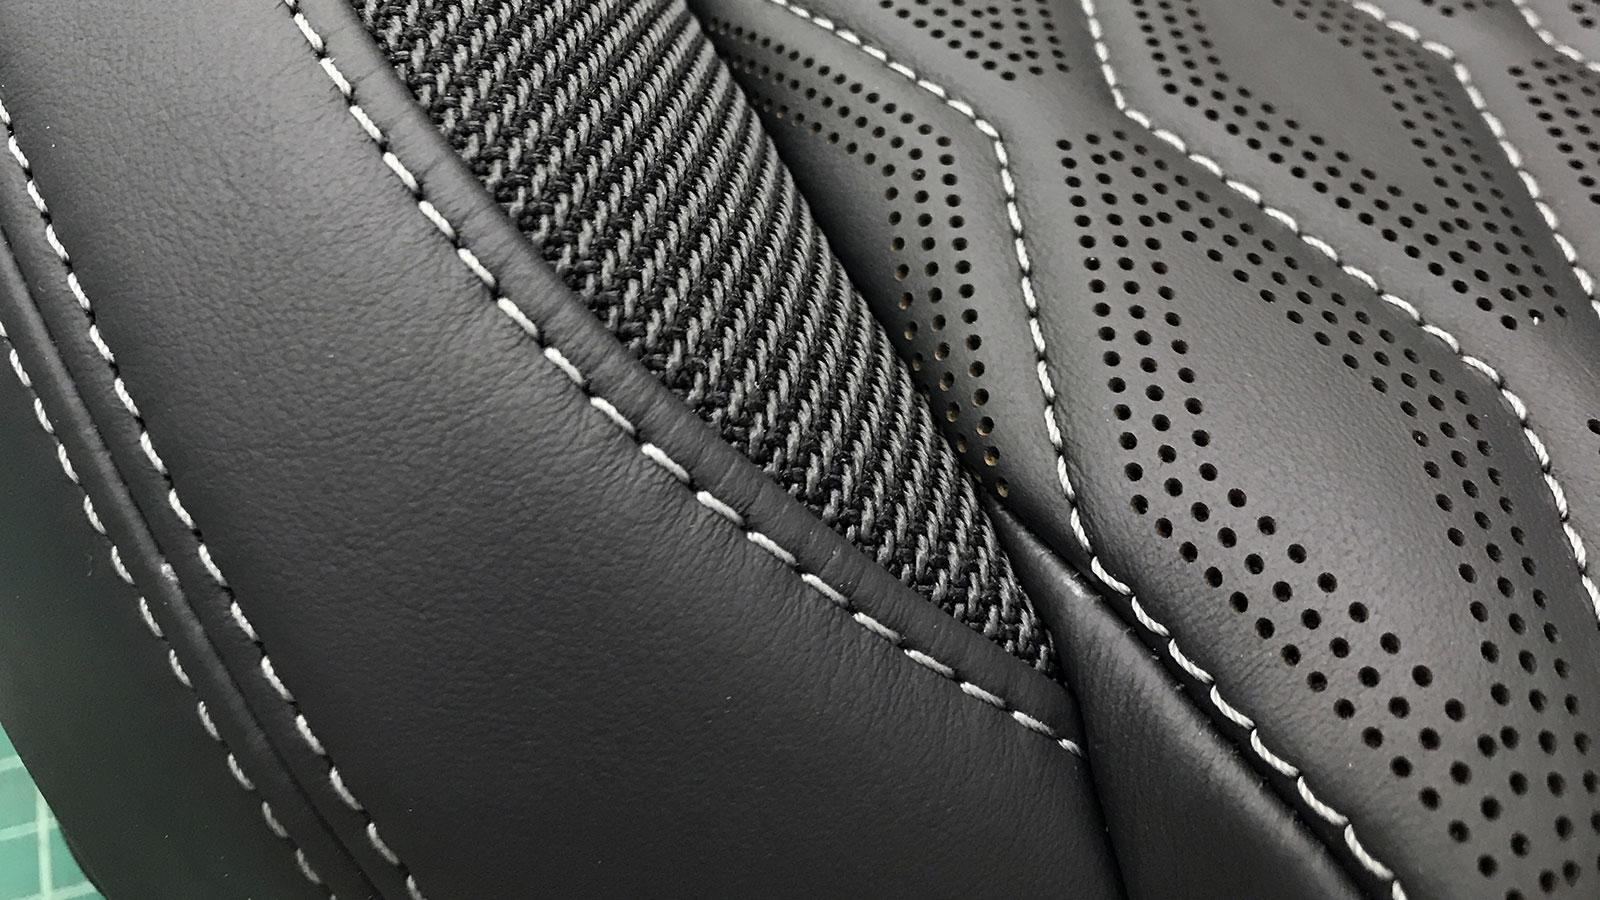 interior-upholstery-closeup